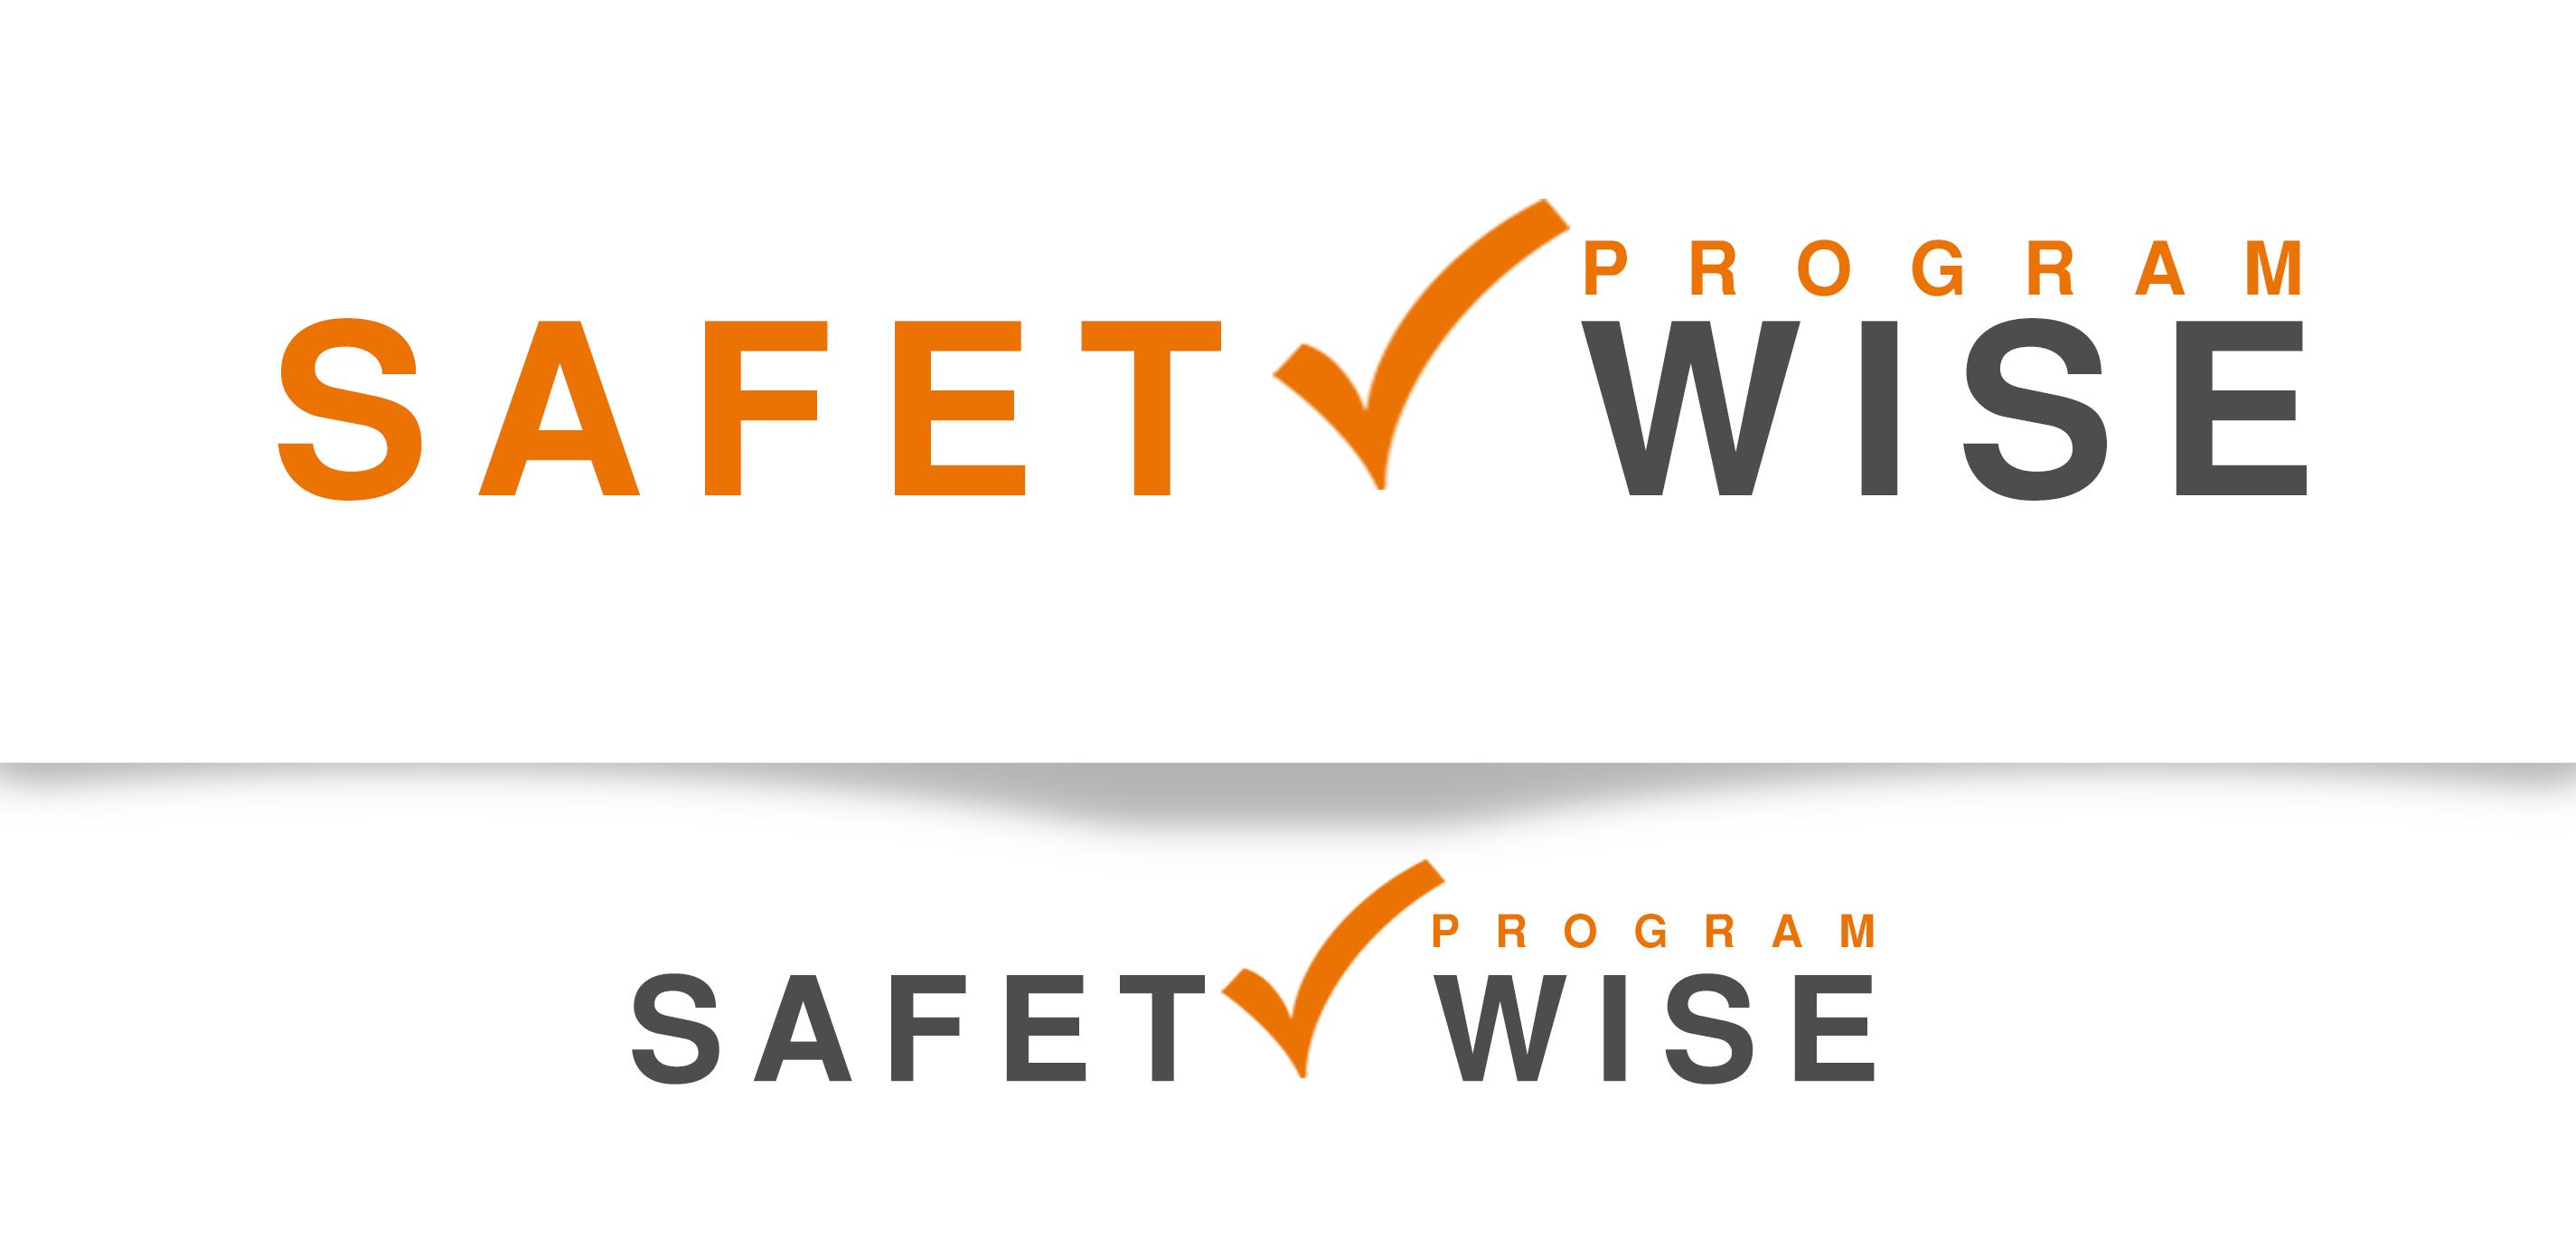 Logo Design by JSDESIGNGROUP - Entry No. 213 in the Logo Design Contest New Logo Design for Safety Wise Program.